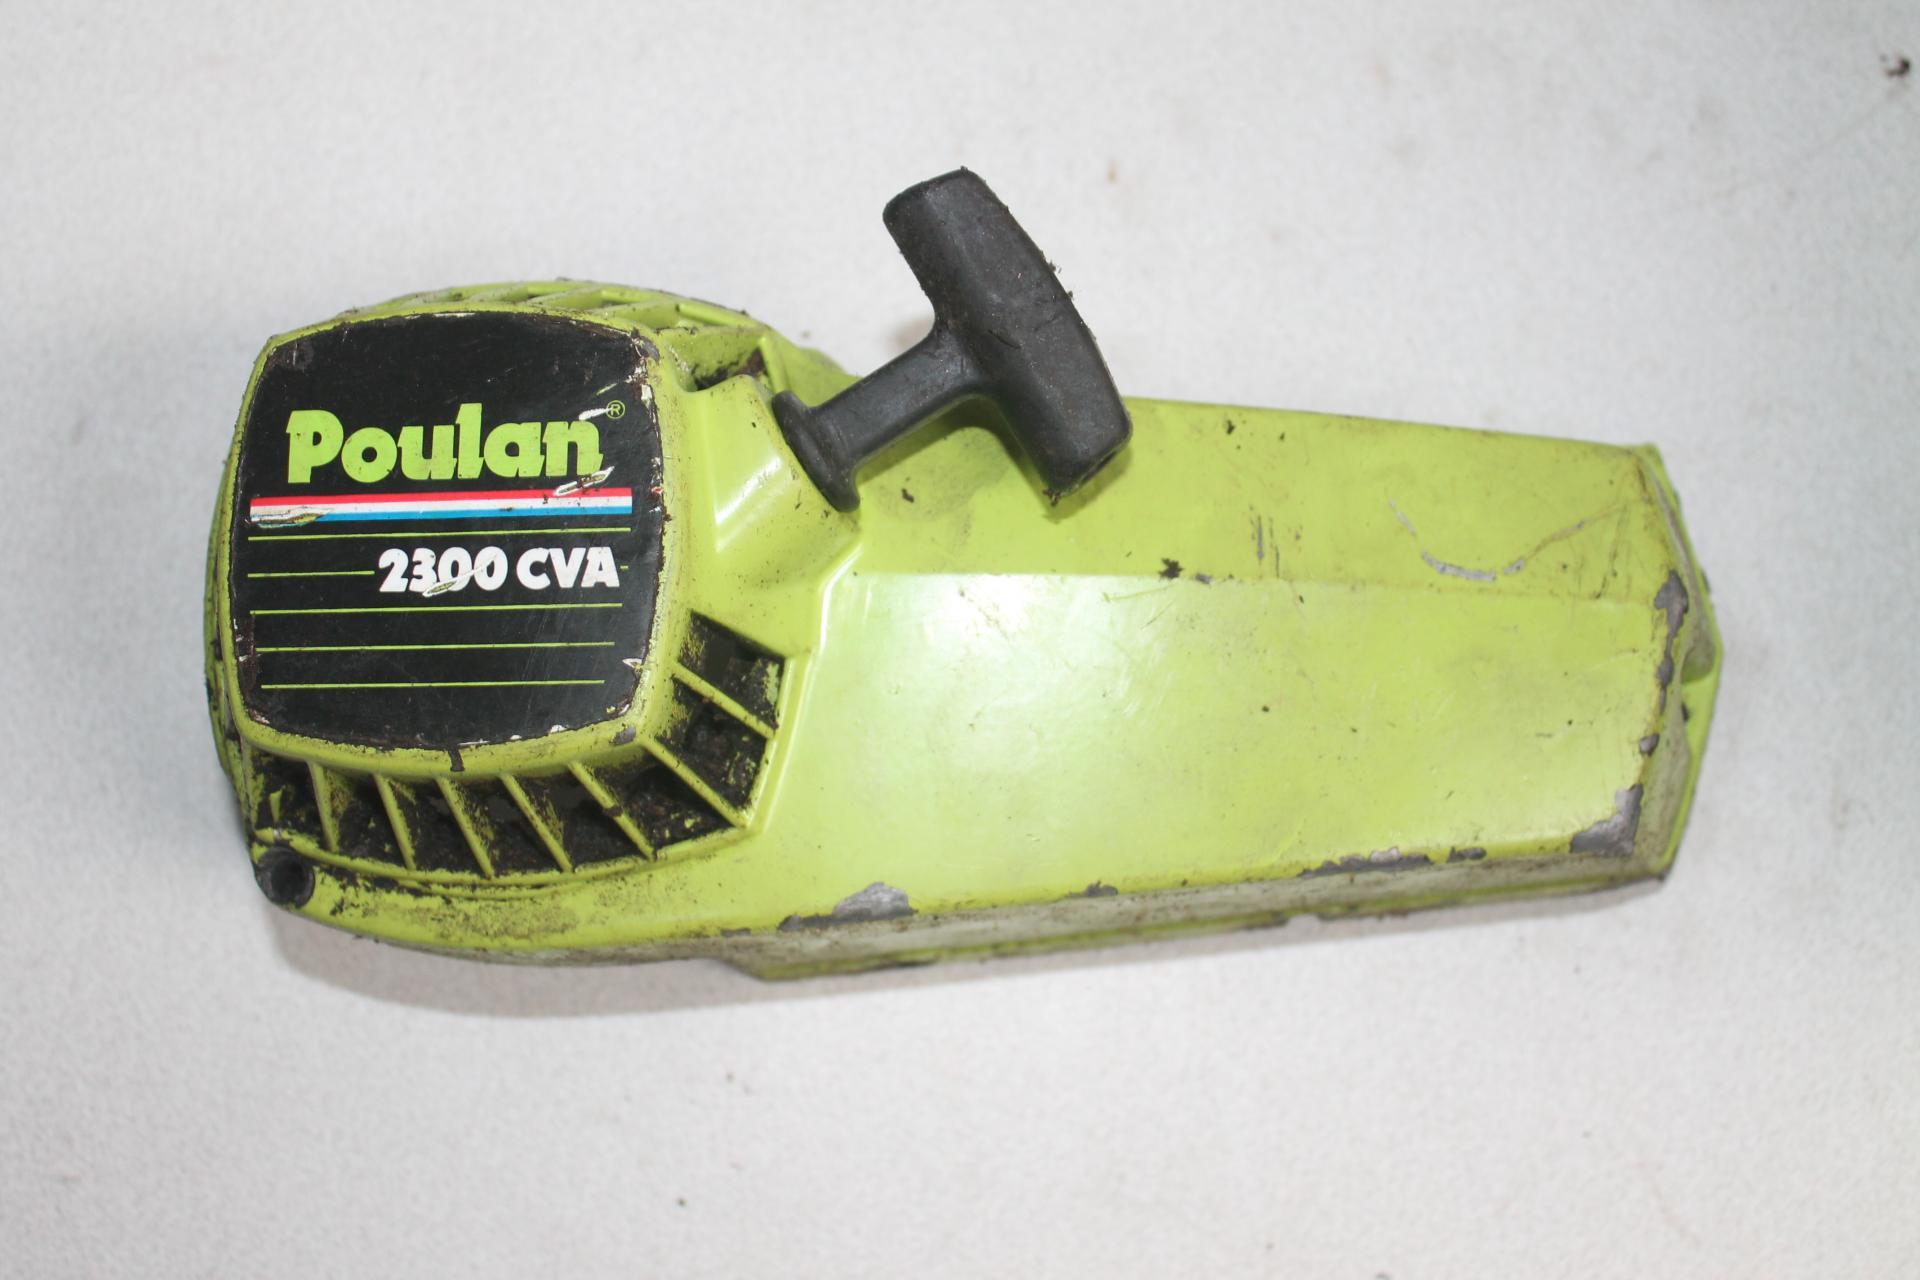 Arranque Poulan 2300 CVA